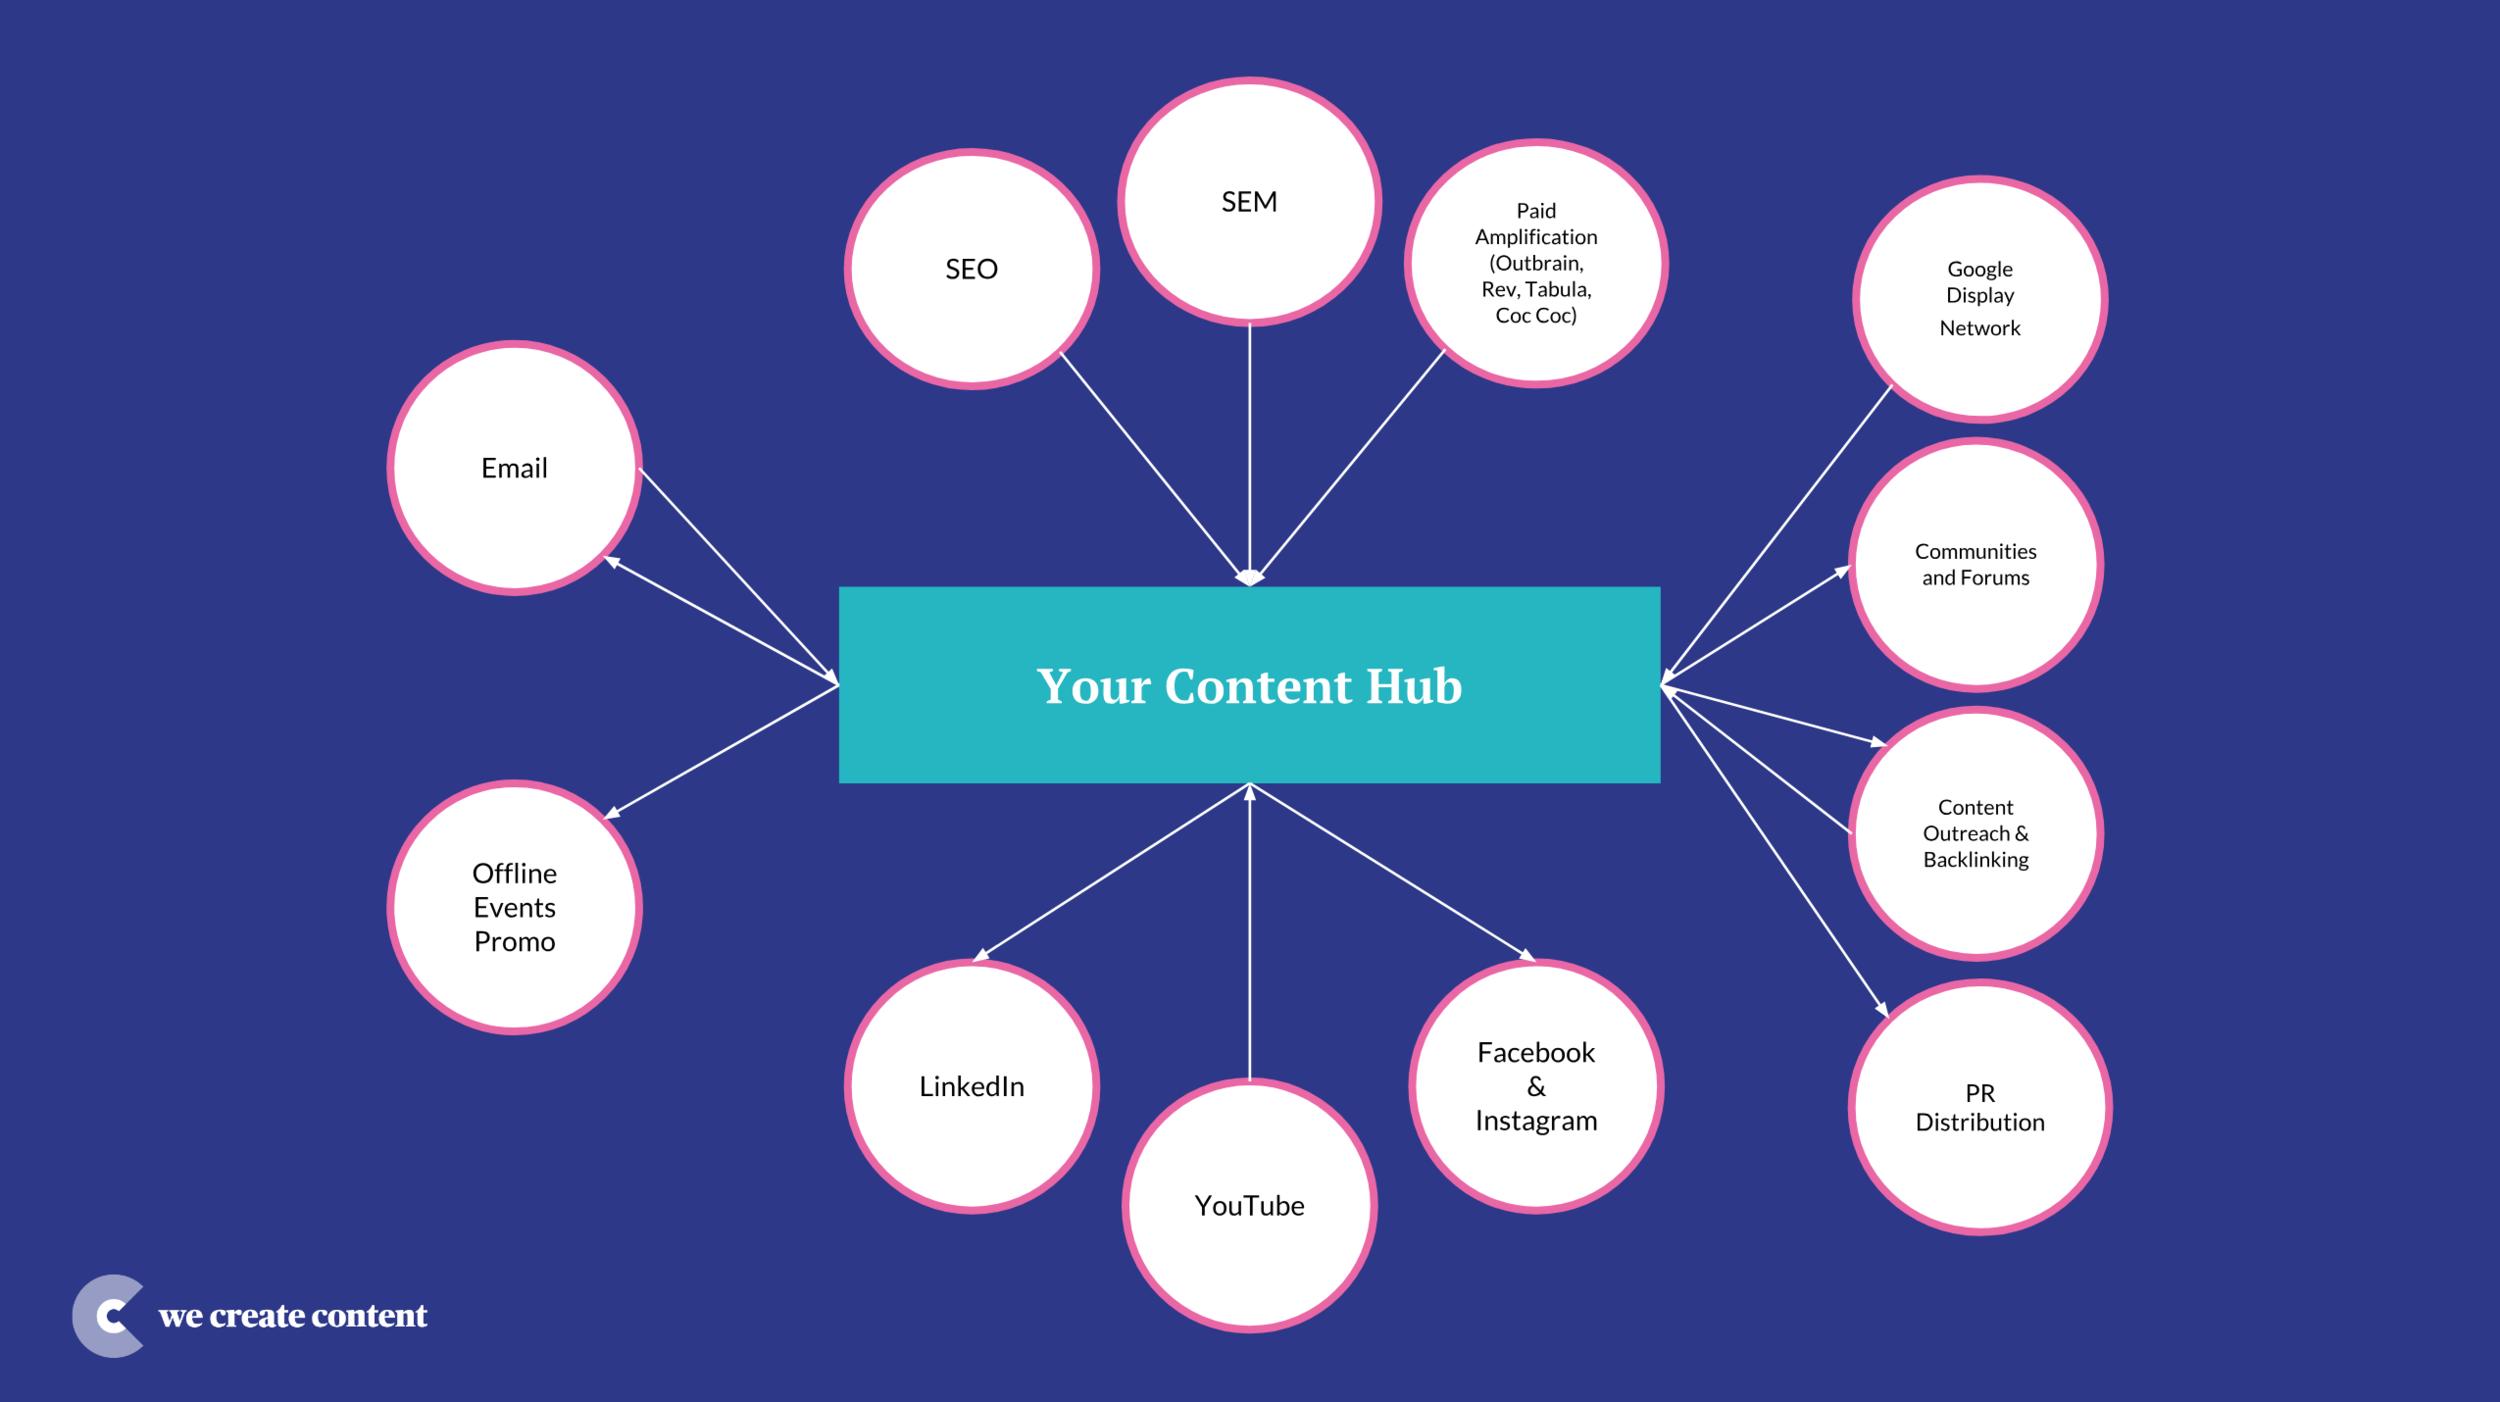 Publishing Ecosystem - We Create Content